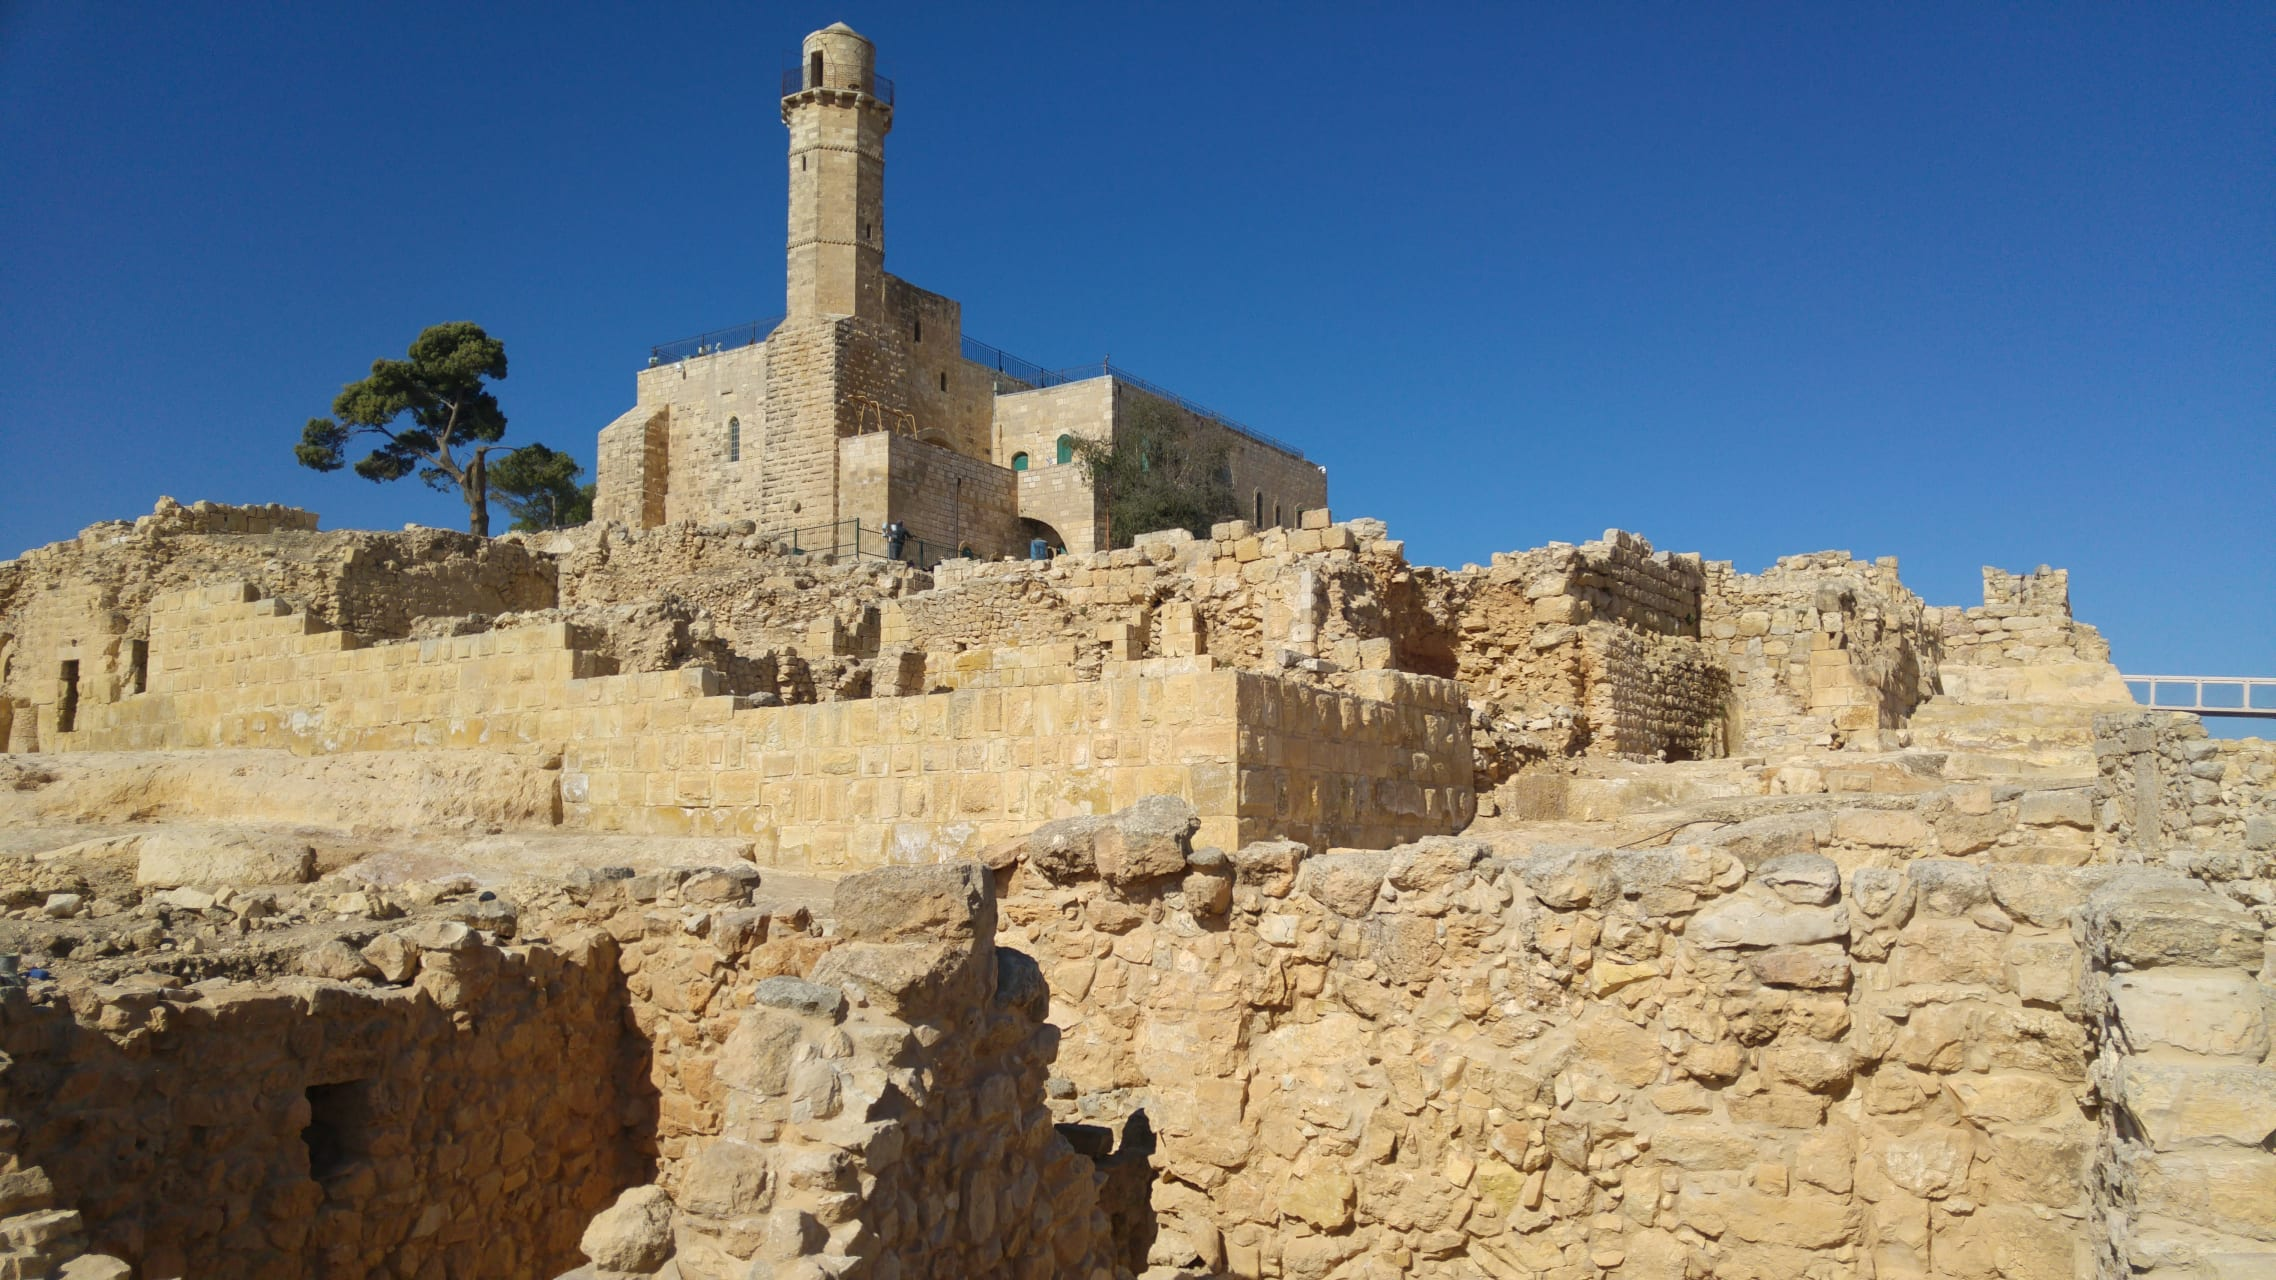 Jerusalem - The Tomb of Prophet Samuel - The Abrahamic Matryoshka (Russian Doll)